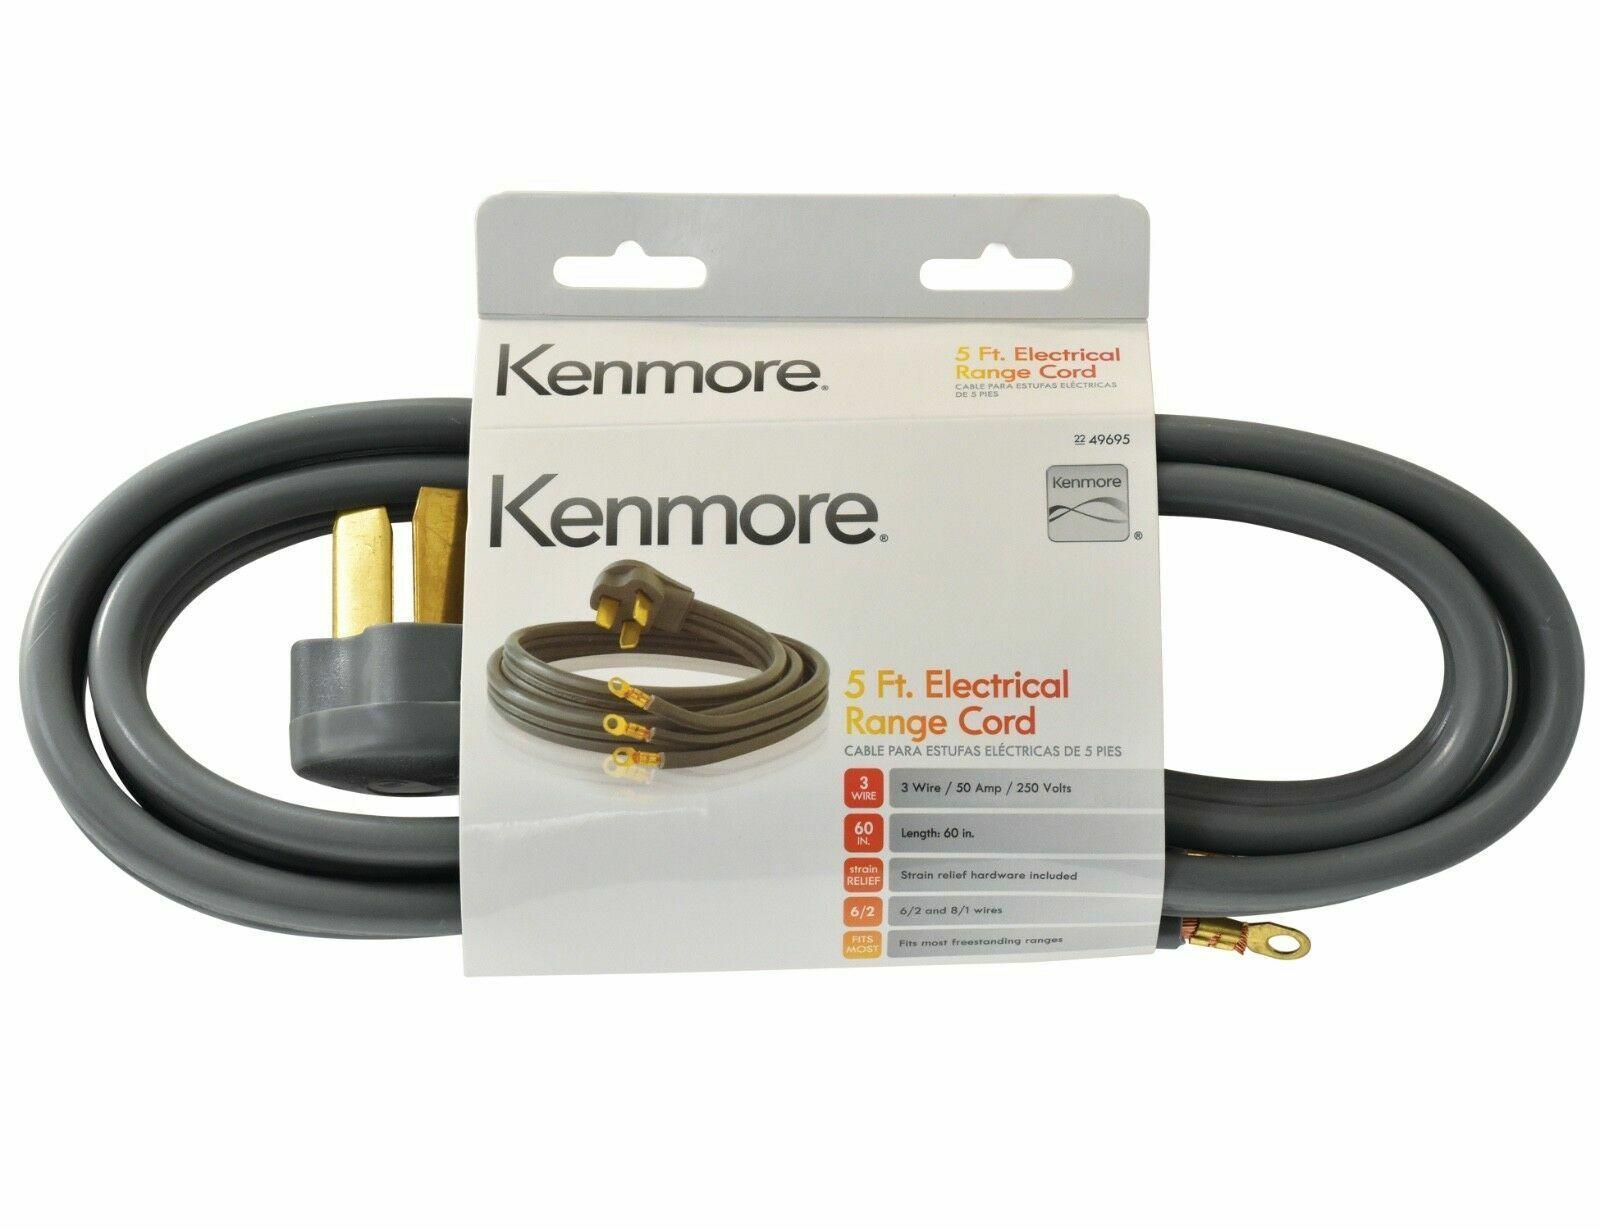 3 prong 5 round gray range cord